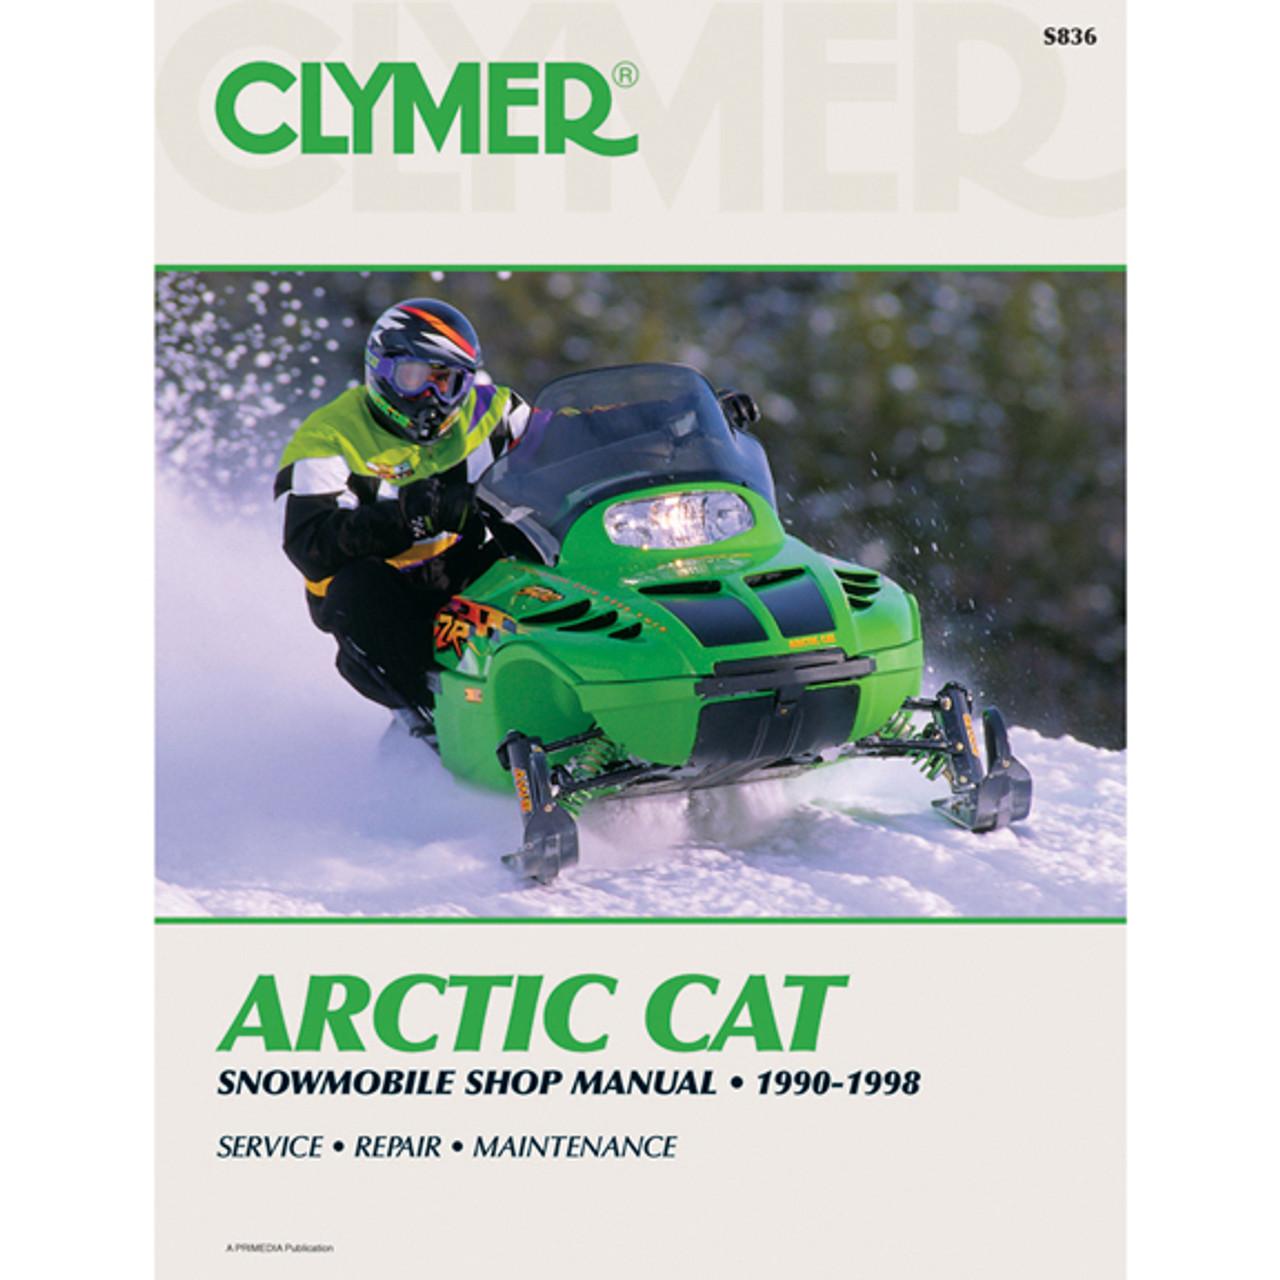 clymer s836 service shop repair manual arctic cat snowmobile 90 98 rh speedaddicts com Seriel Numer Location Arctic Cat Arctic Cat ATV Repair Manuals